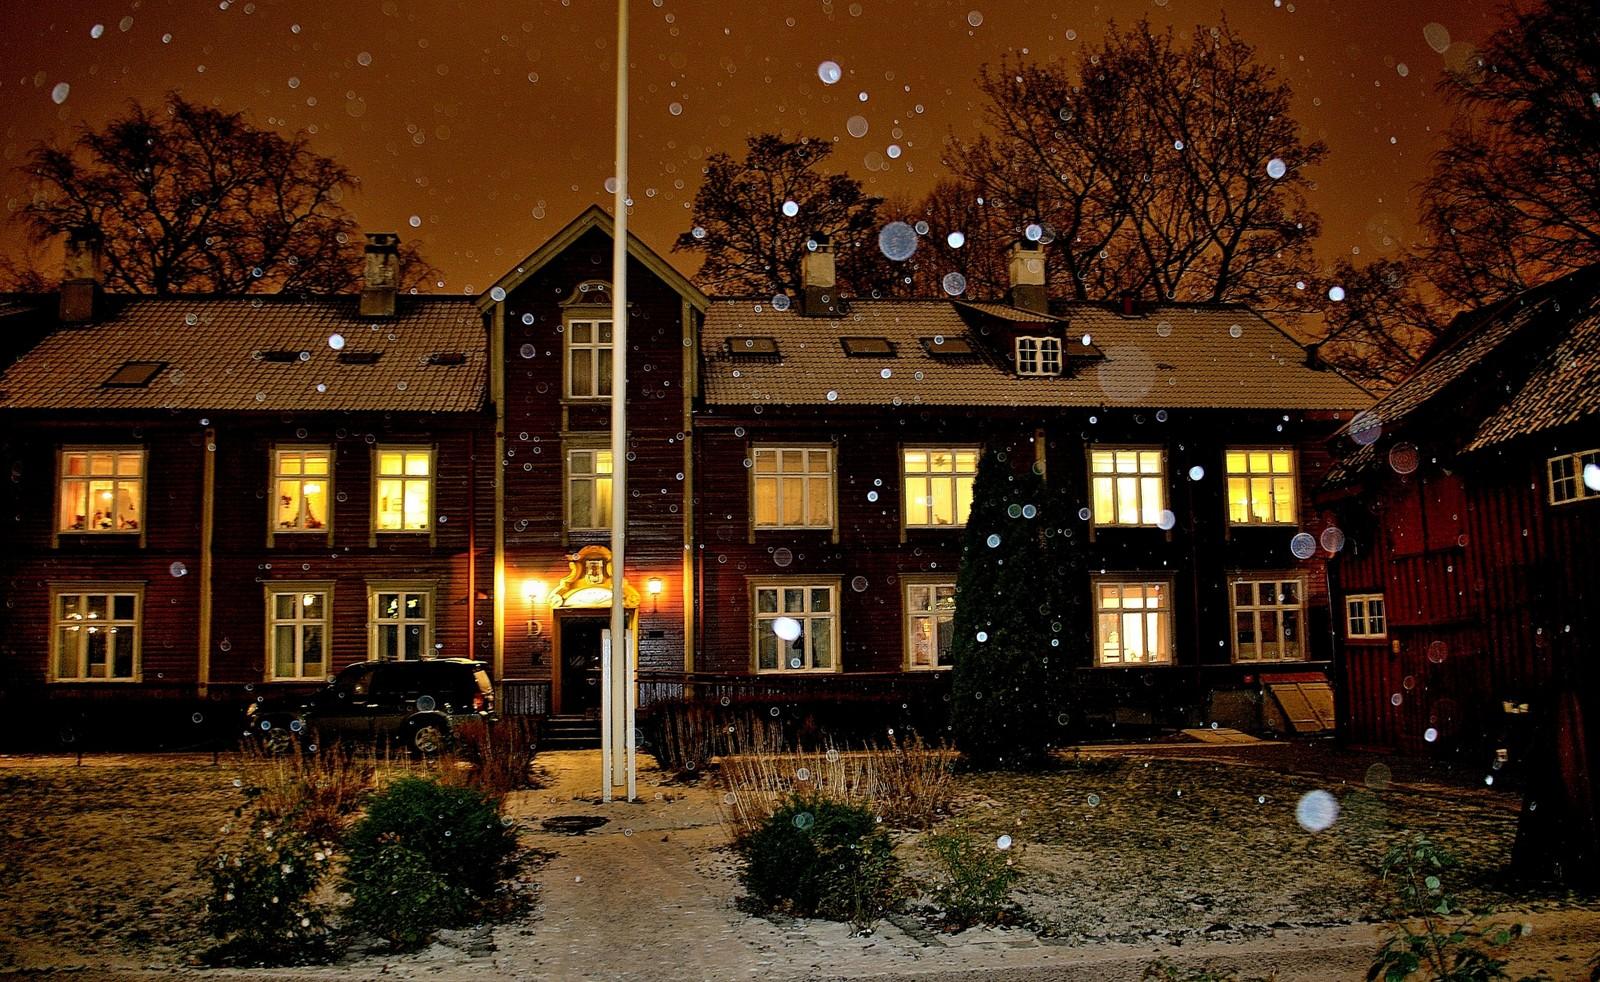 November: Waisenhuset i Trondheim